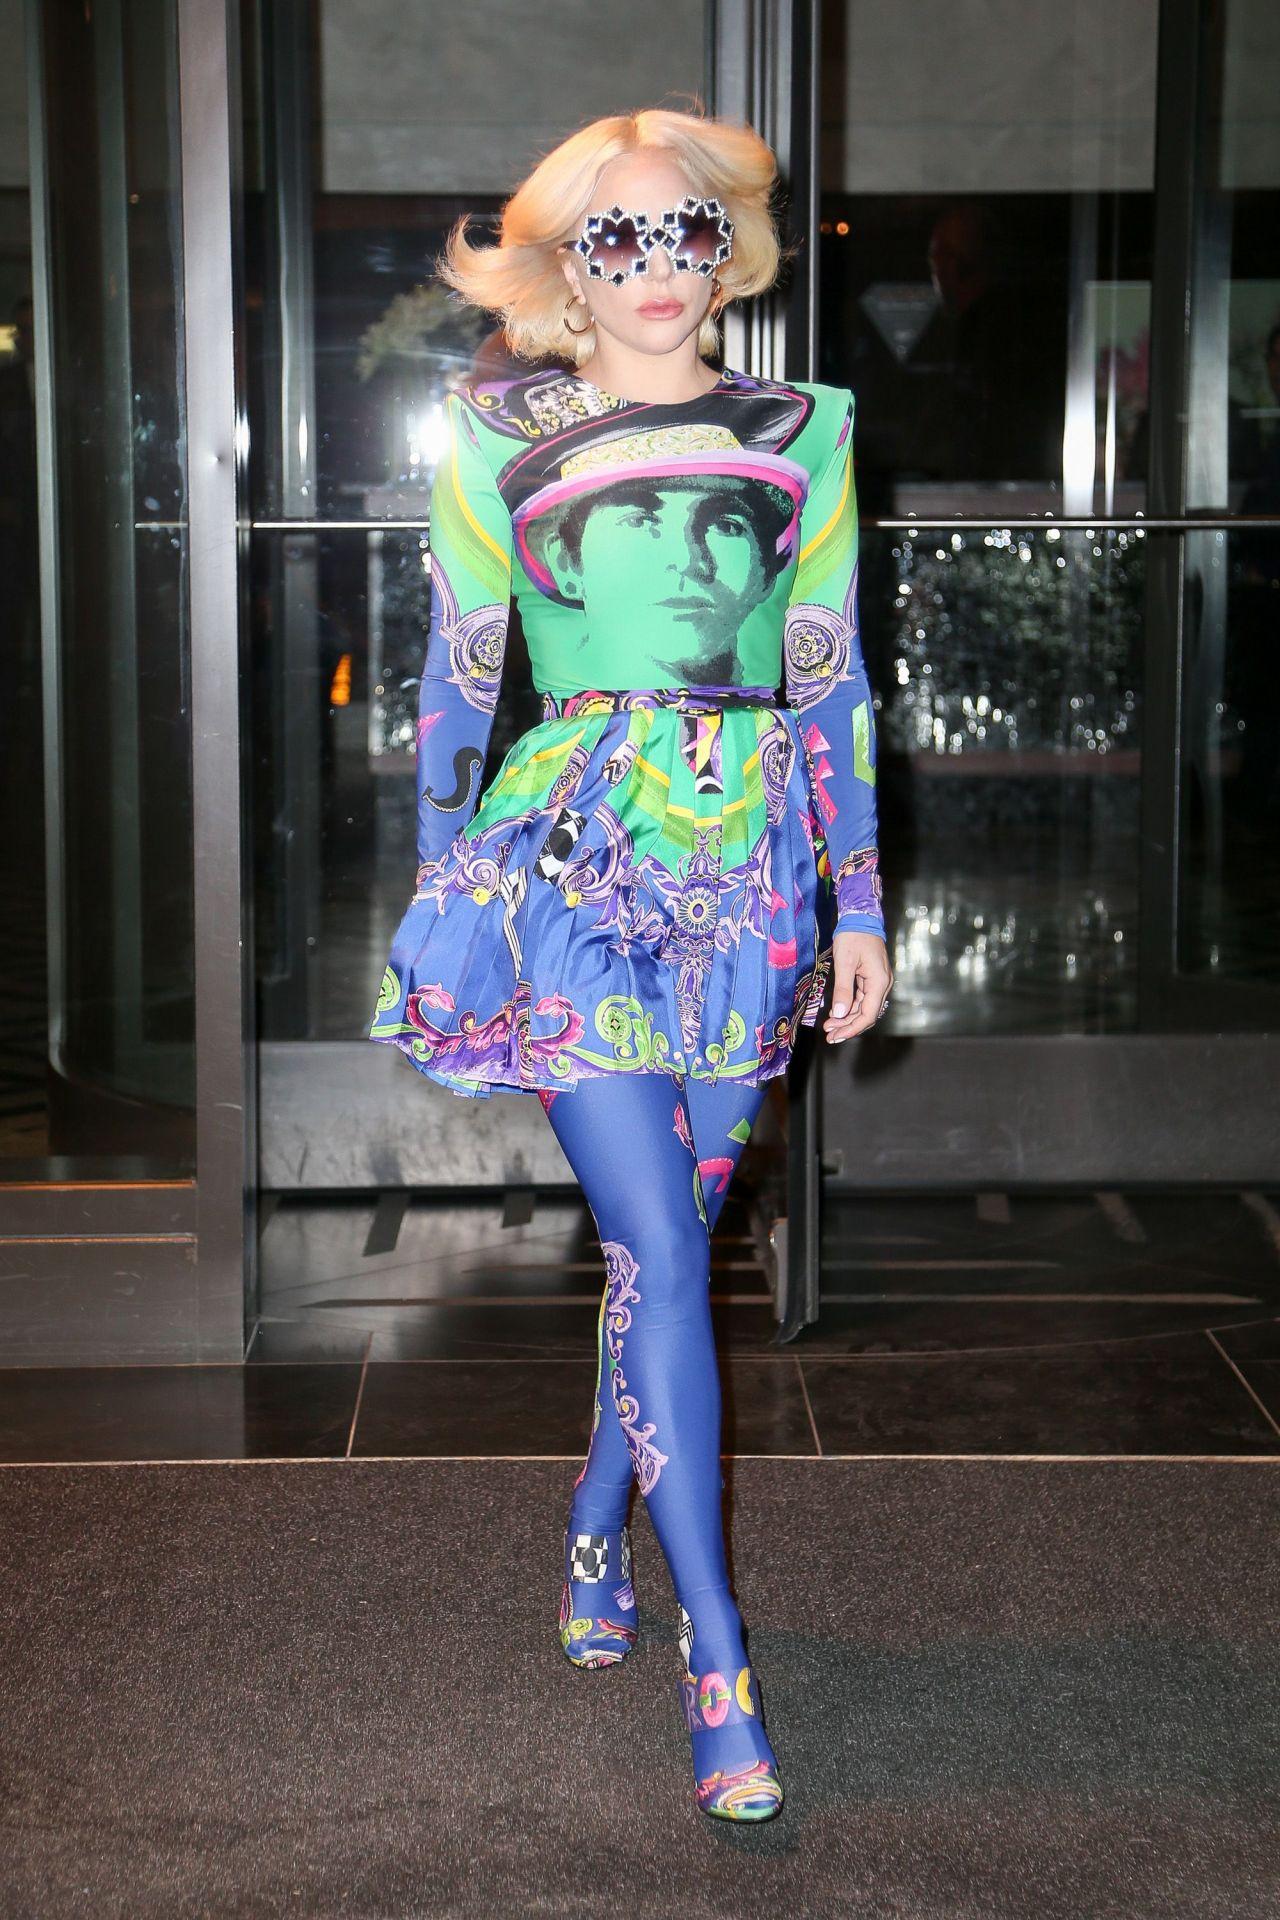 Lady Gaga in a Multicolored Dress